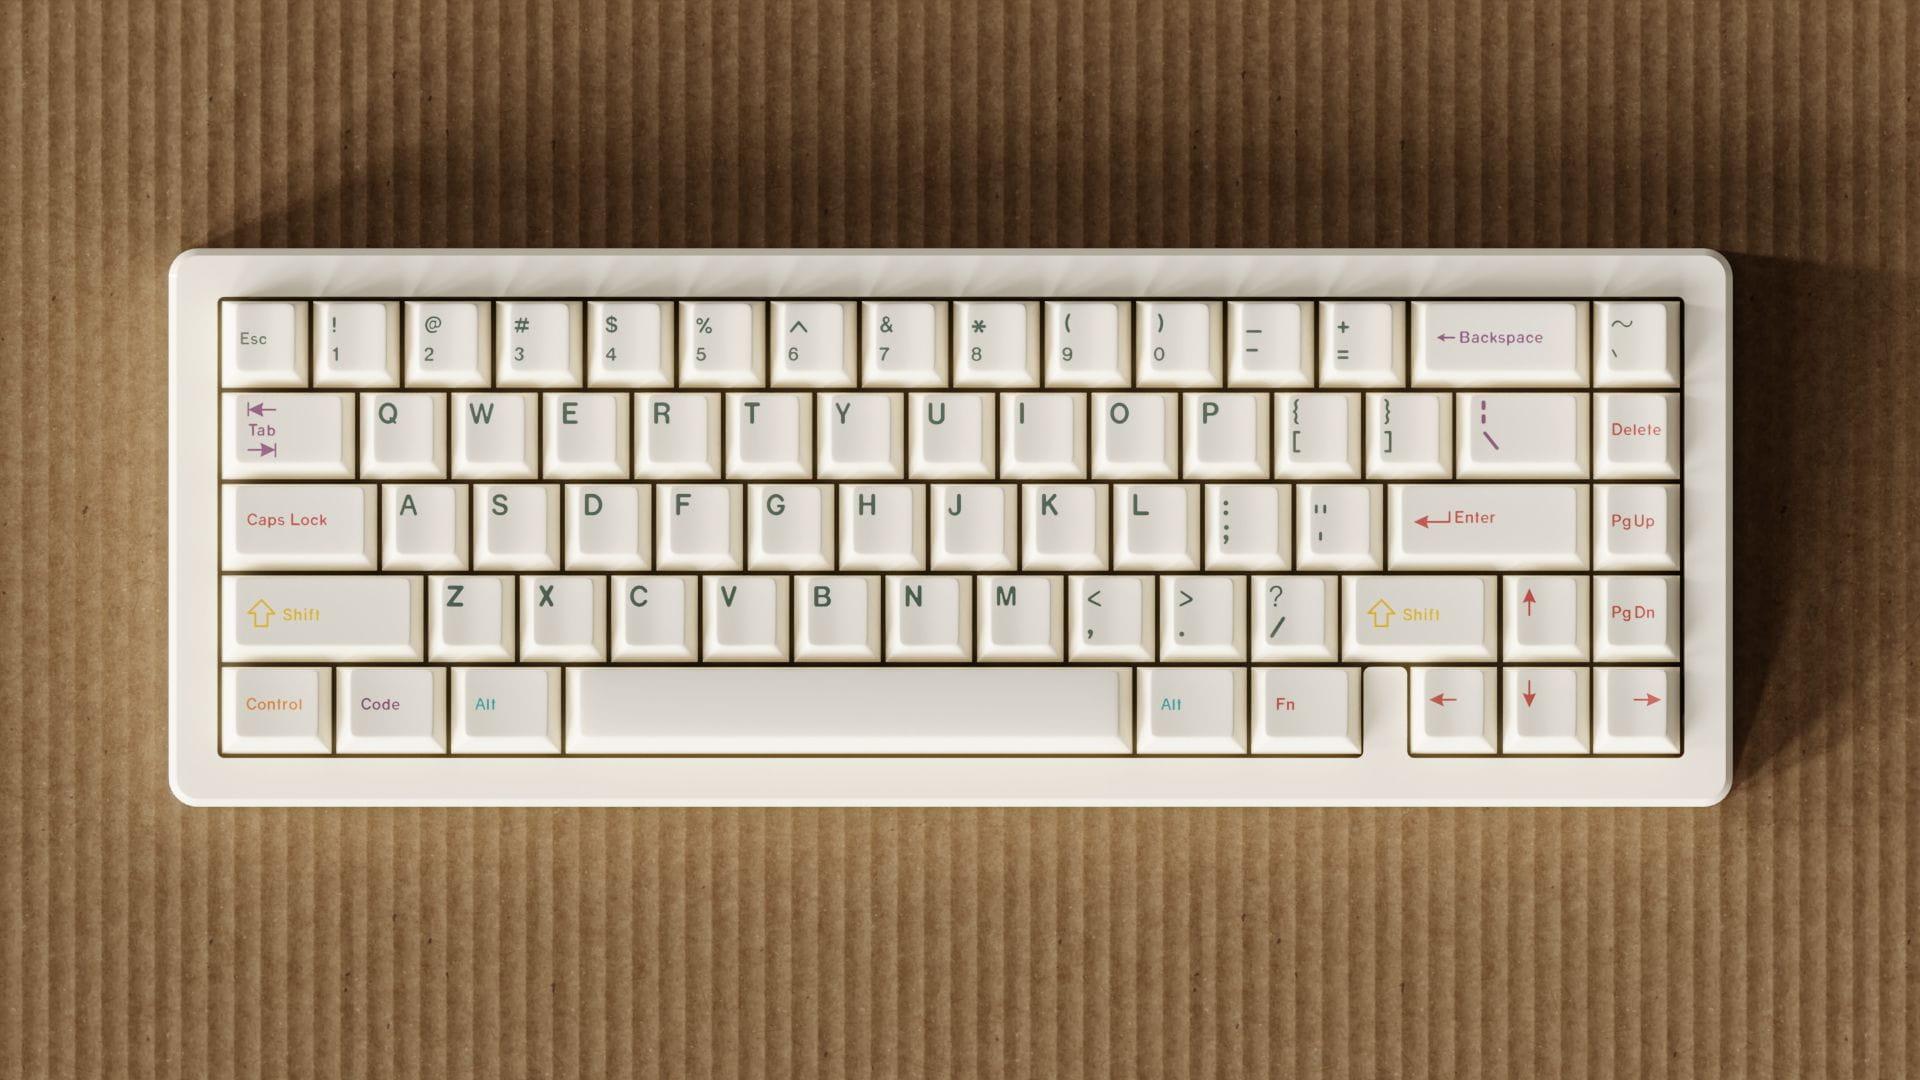 ePBT Grand Tour Pizza Keyboard